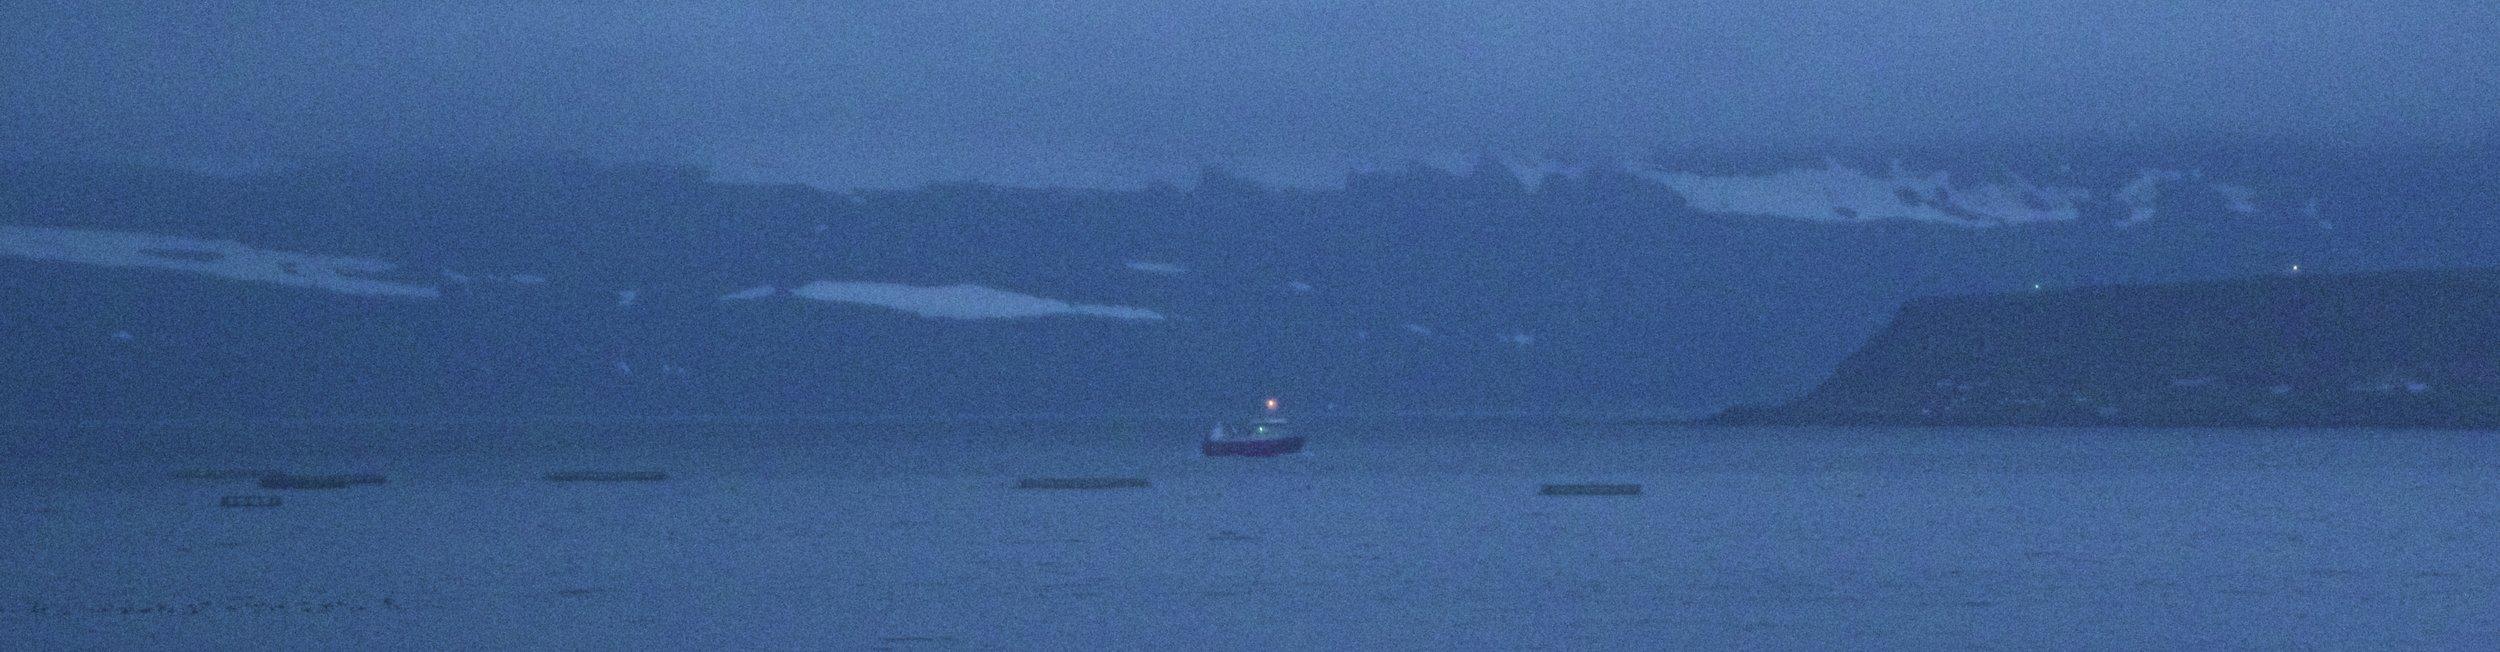 isafjordur-westfjords-iceland-7